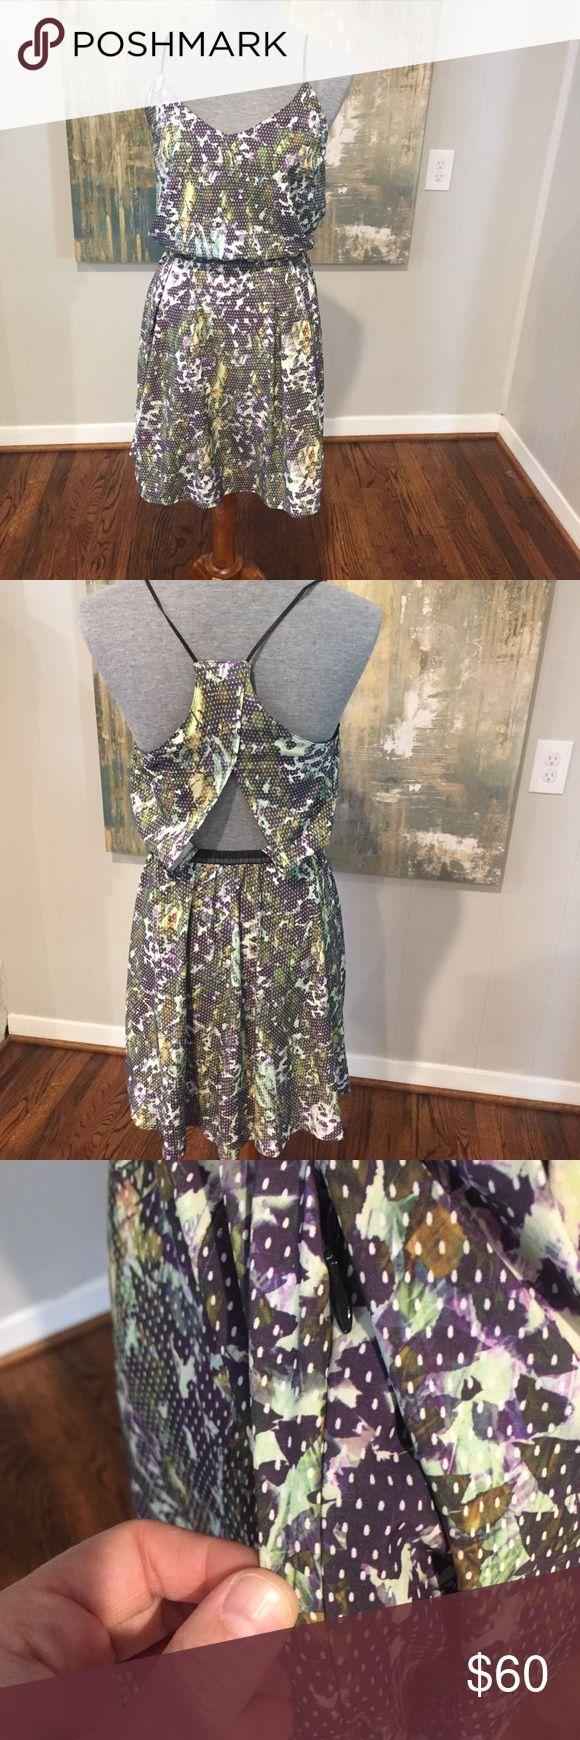 Lululemon dress Lululemon dress great for tennis or travel. EUC. Dry-fit material, hidden zipper pockets on side seams. lululemon athletica Dresses